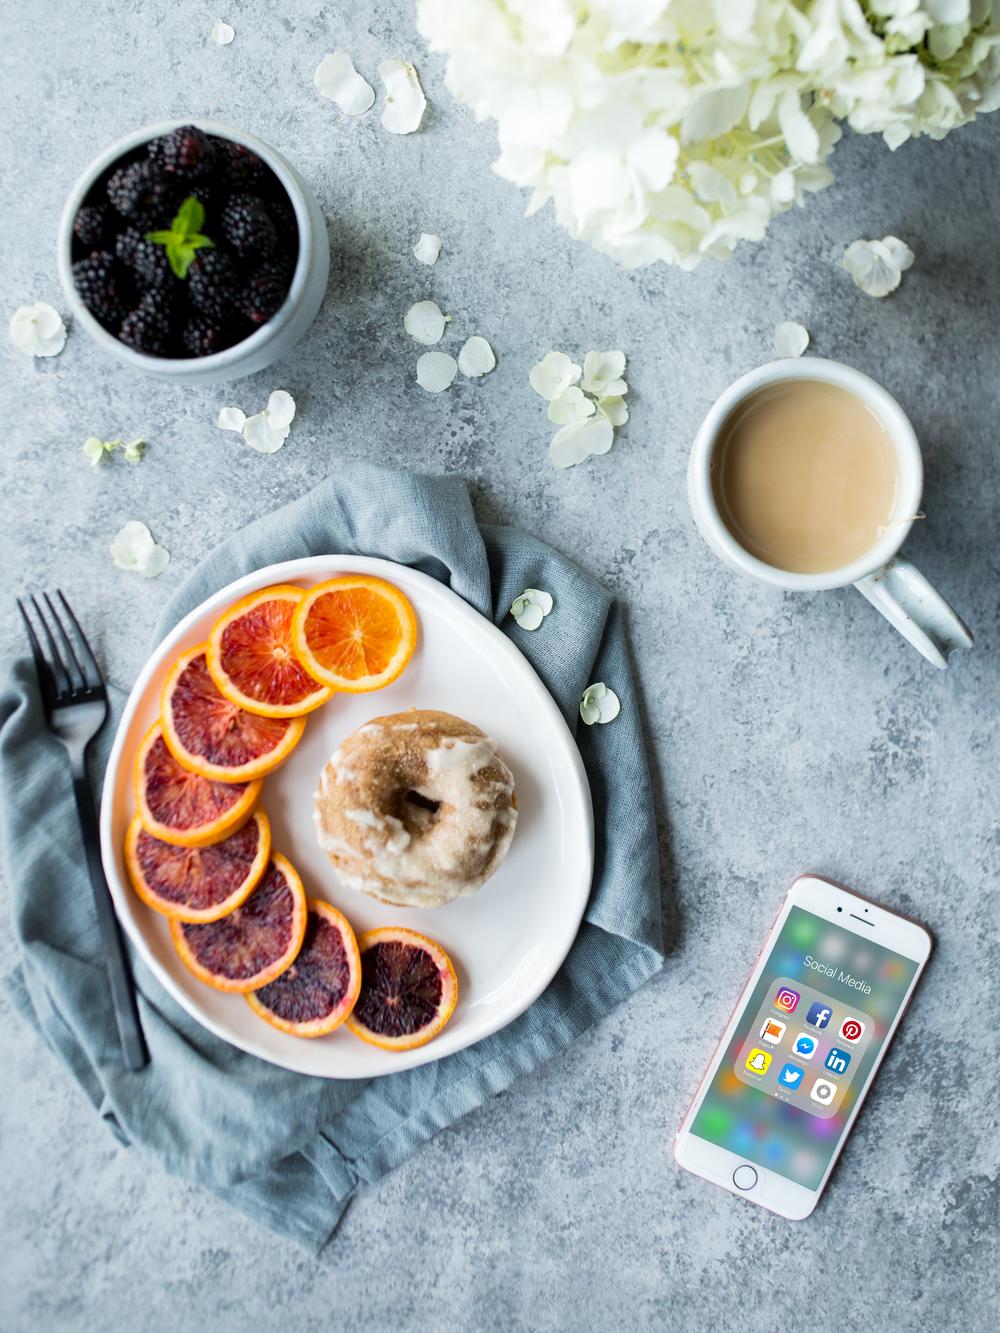 How to Create Healthy Boundaries with Social Media   Jennifer Diaz   Healthy Lifestyle   Productivity   Life Balance   Healthy Habits   Healthy Technology